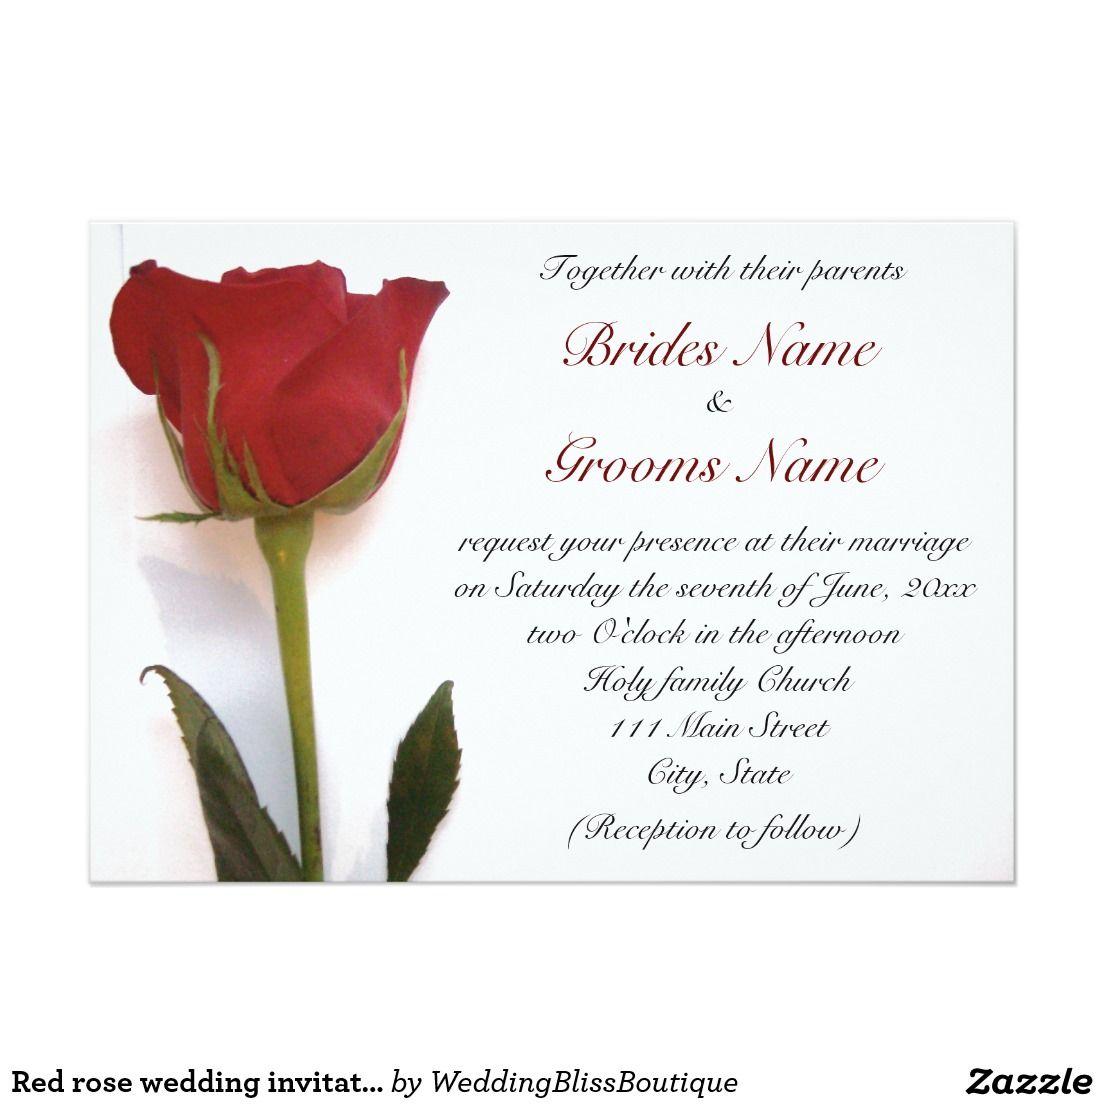 Red rose wedding invitation wedding invitations from zazzlers red rose wedding invitation stopboris Choice Image